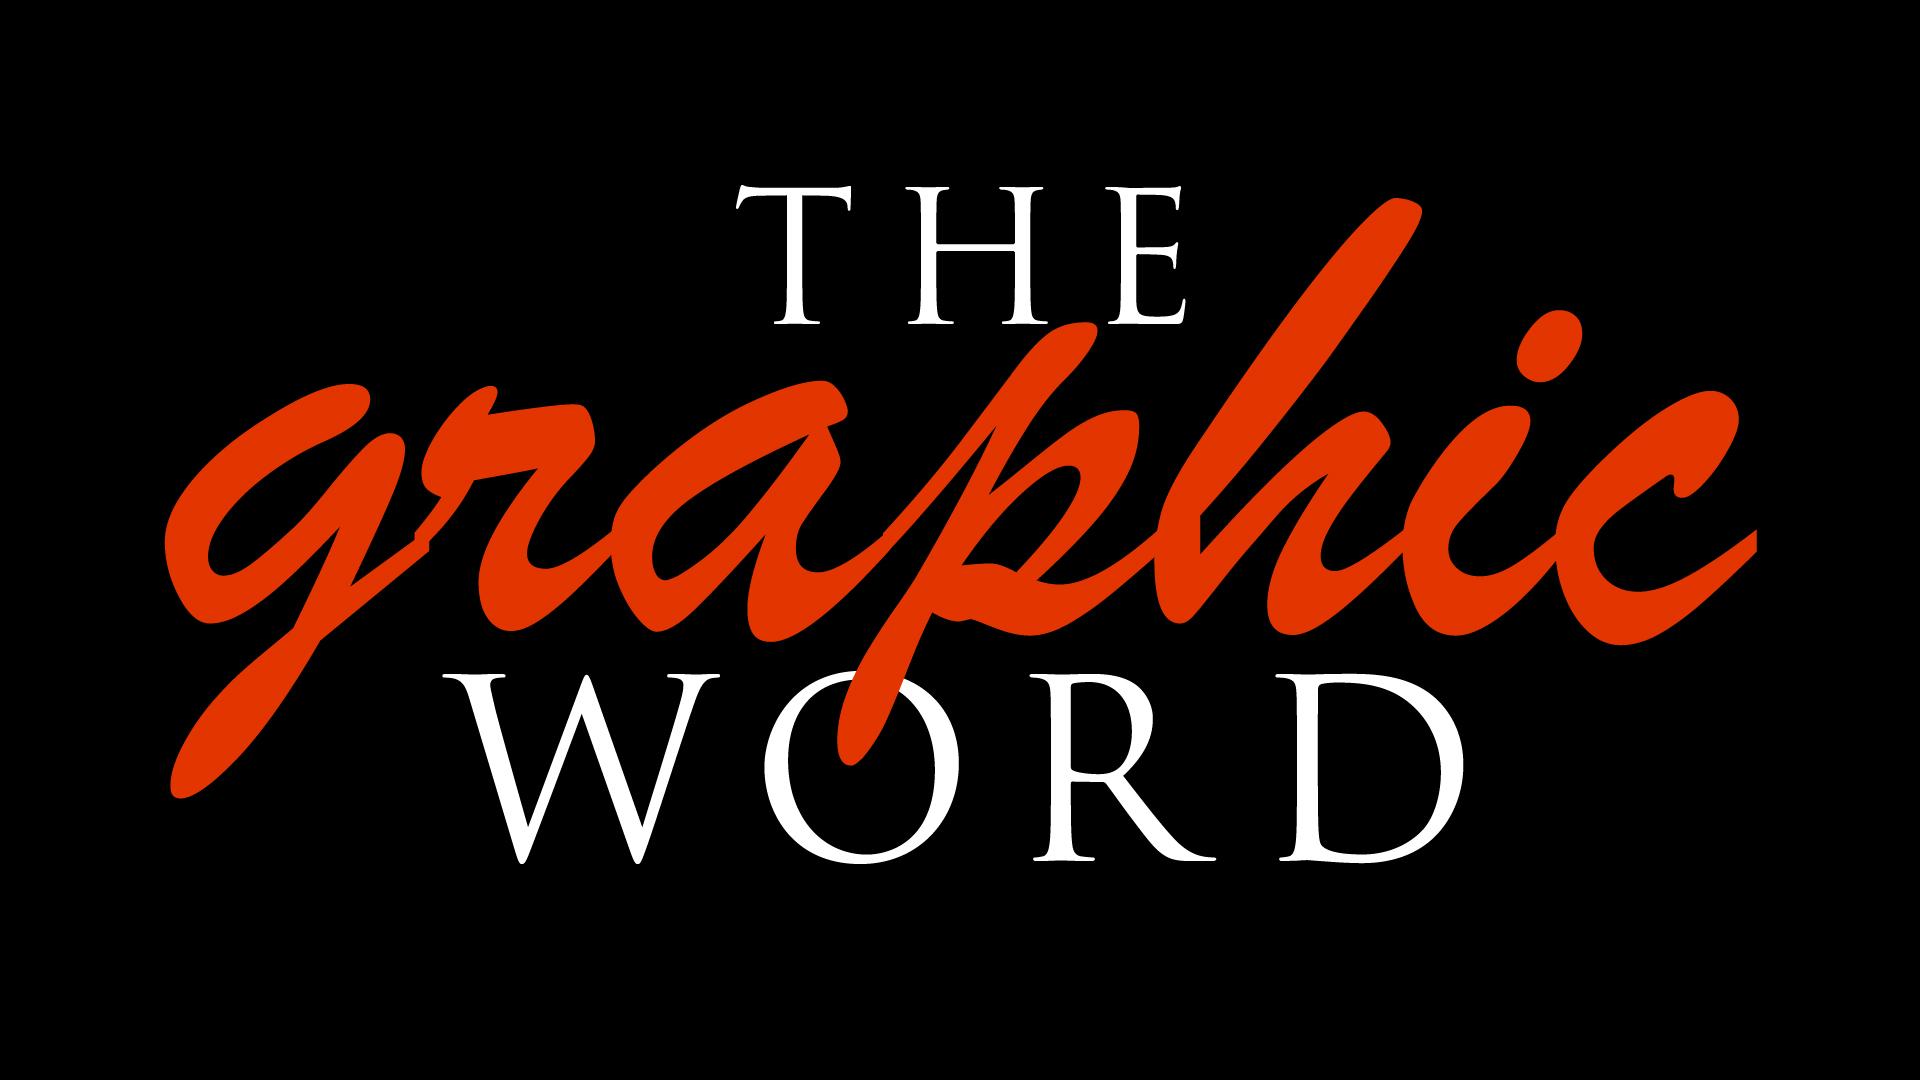 Graphic_Word_titletreatment.jpg